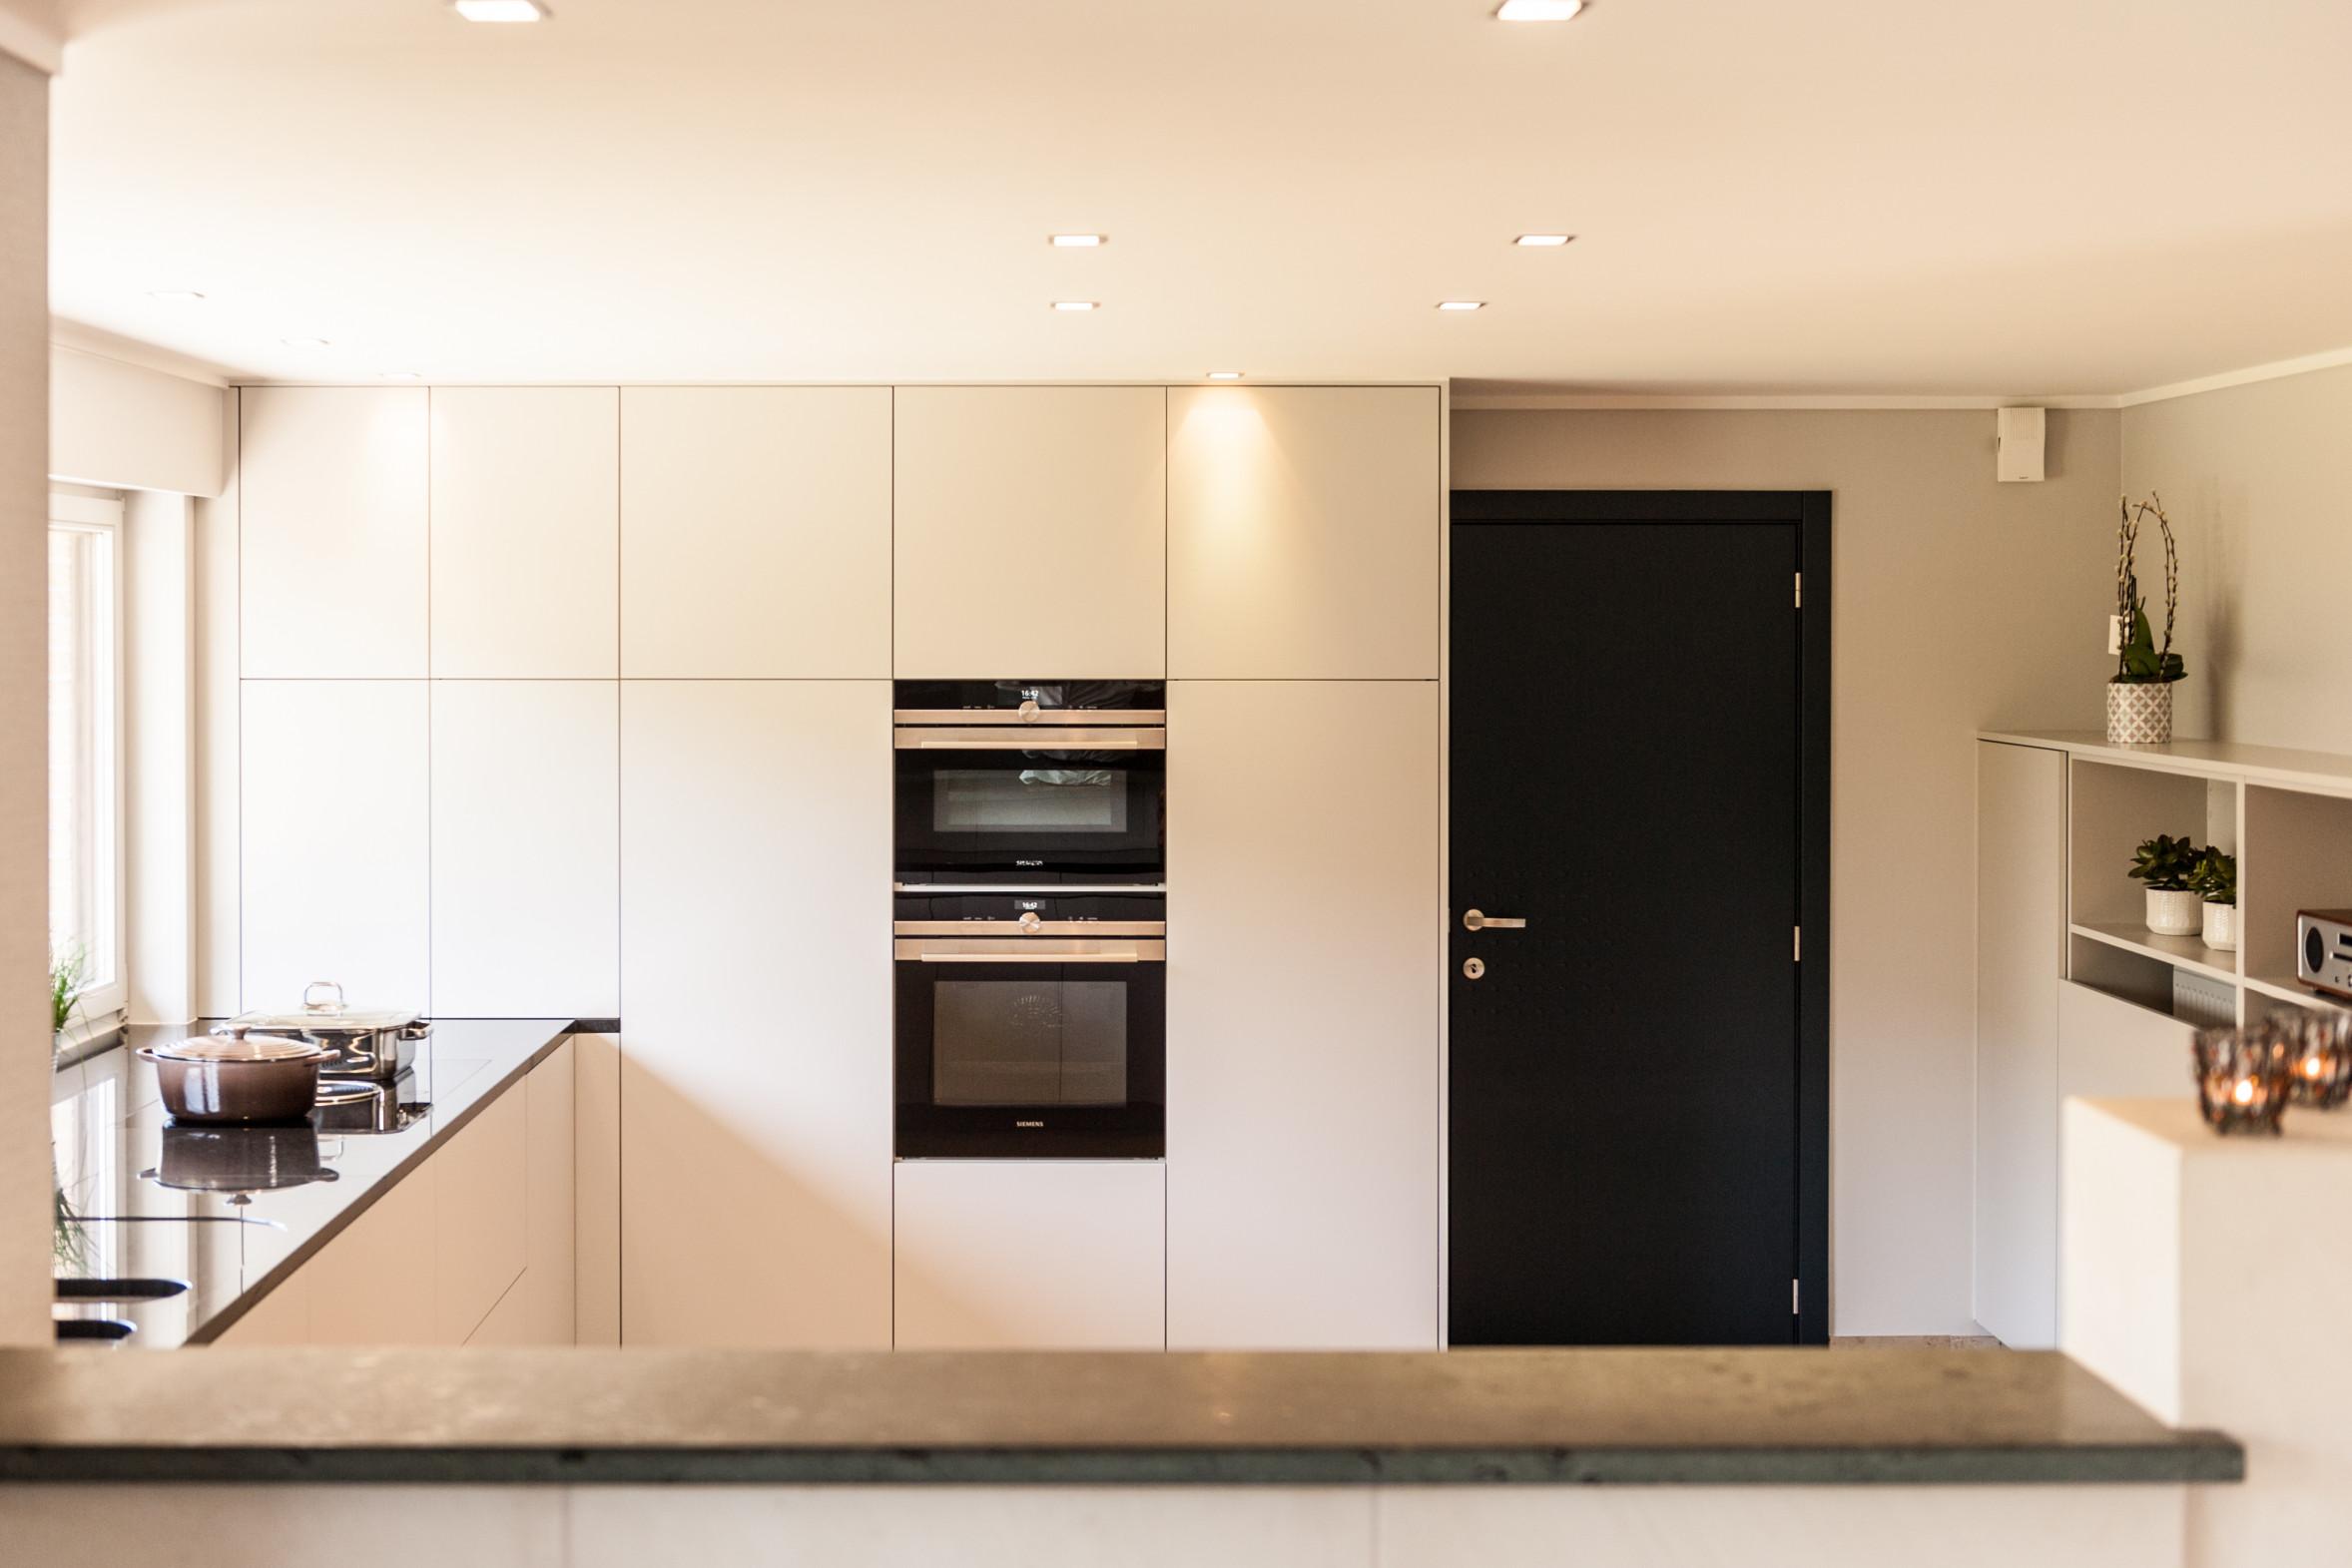 Moderne keuken siemens toestellen.jpg